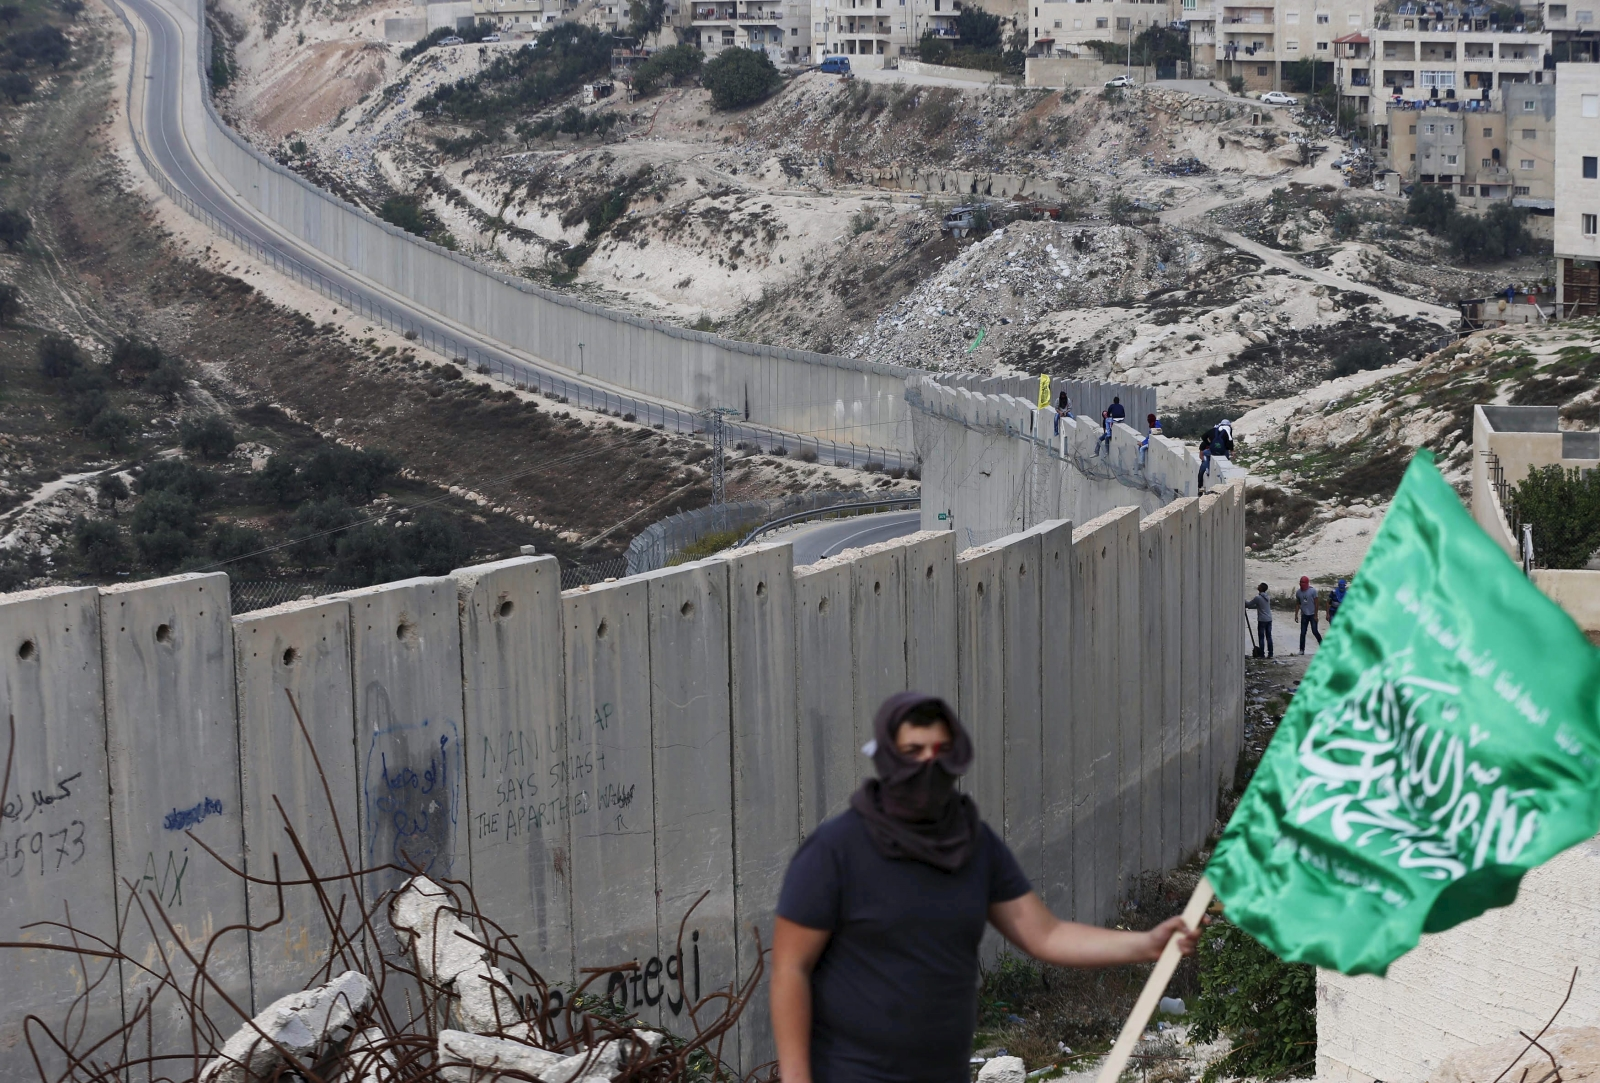 Palestine Hamas flag